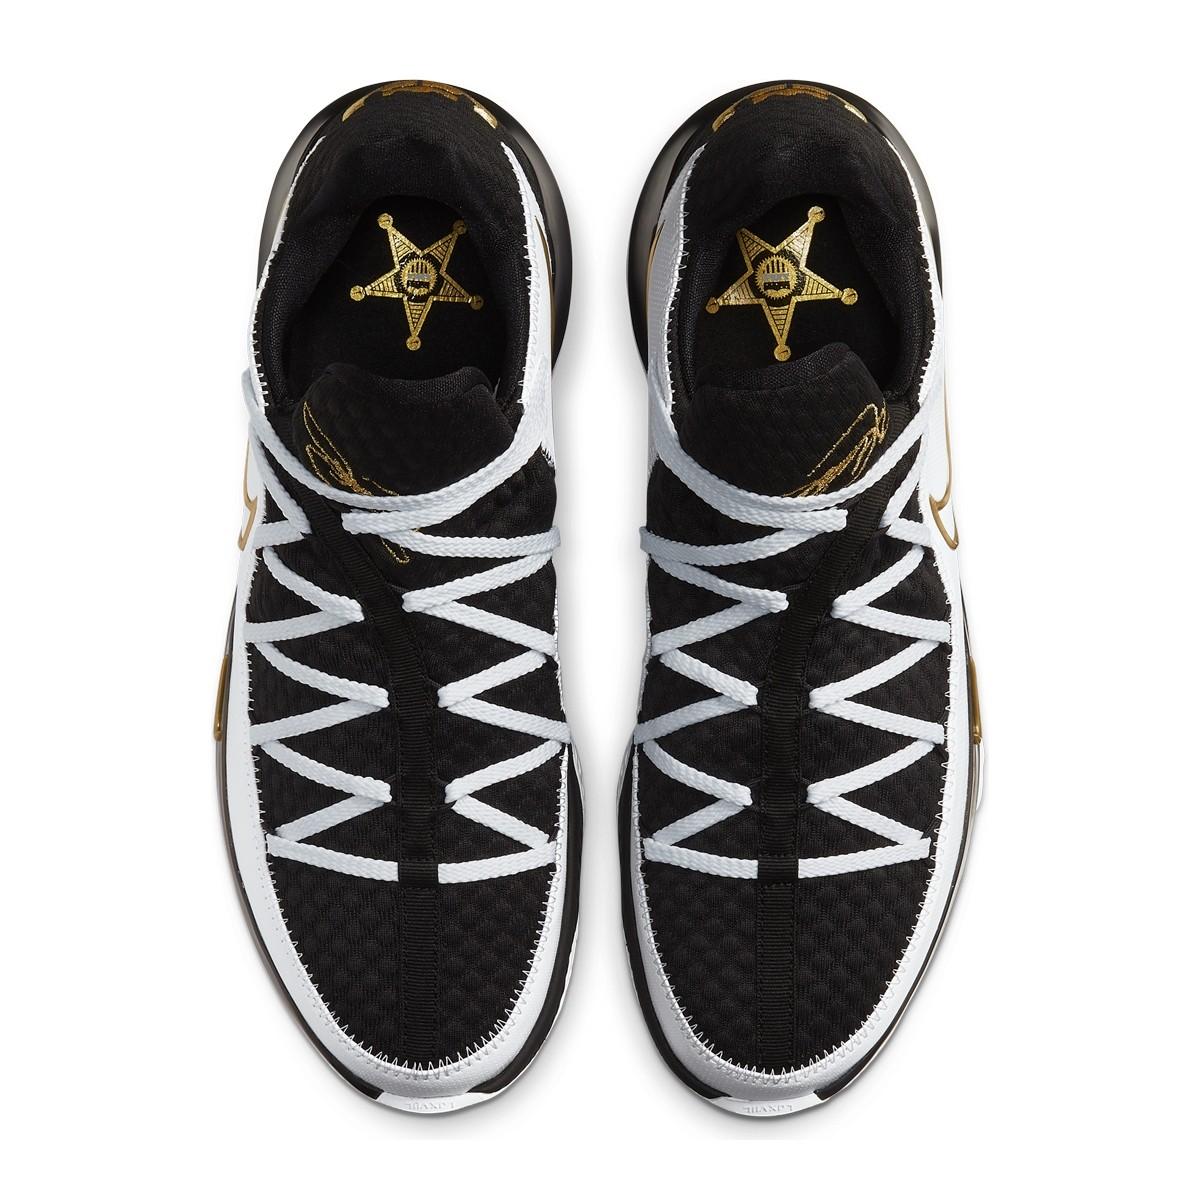 Nike Lebron XVII Low 'Metallic Gold' CD5007-101